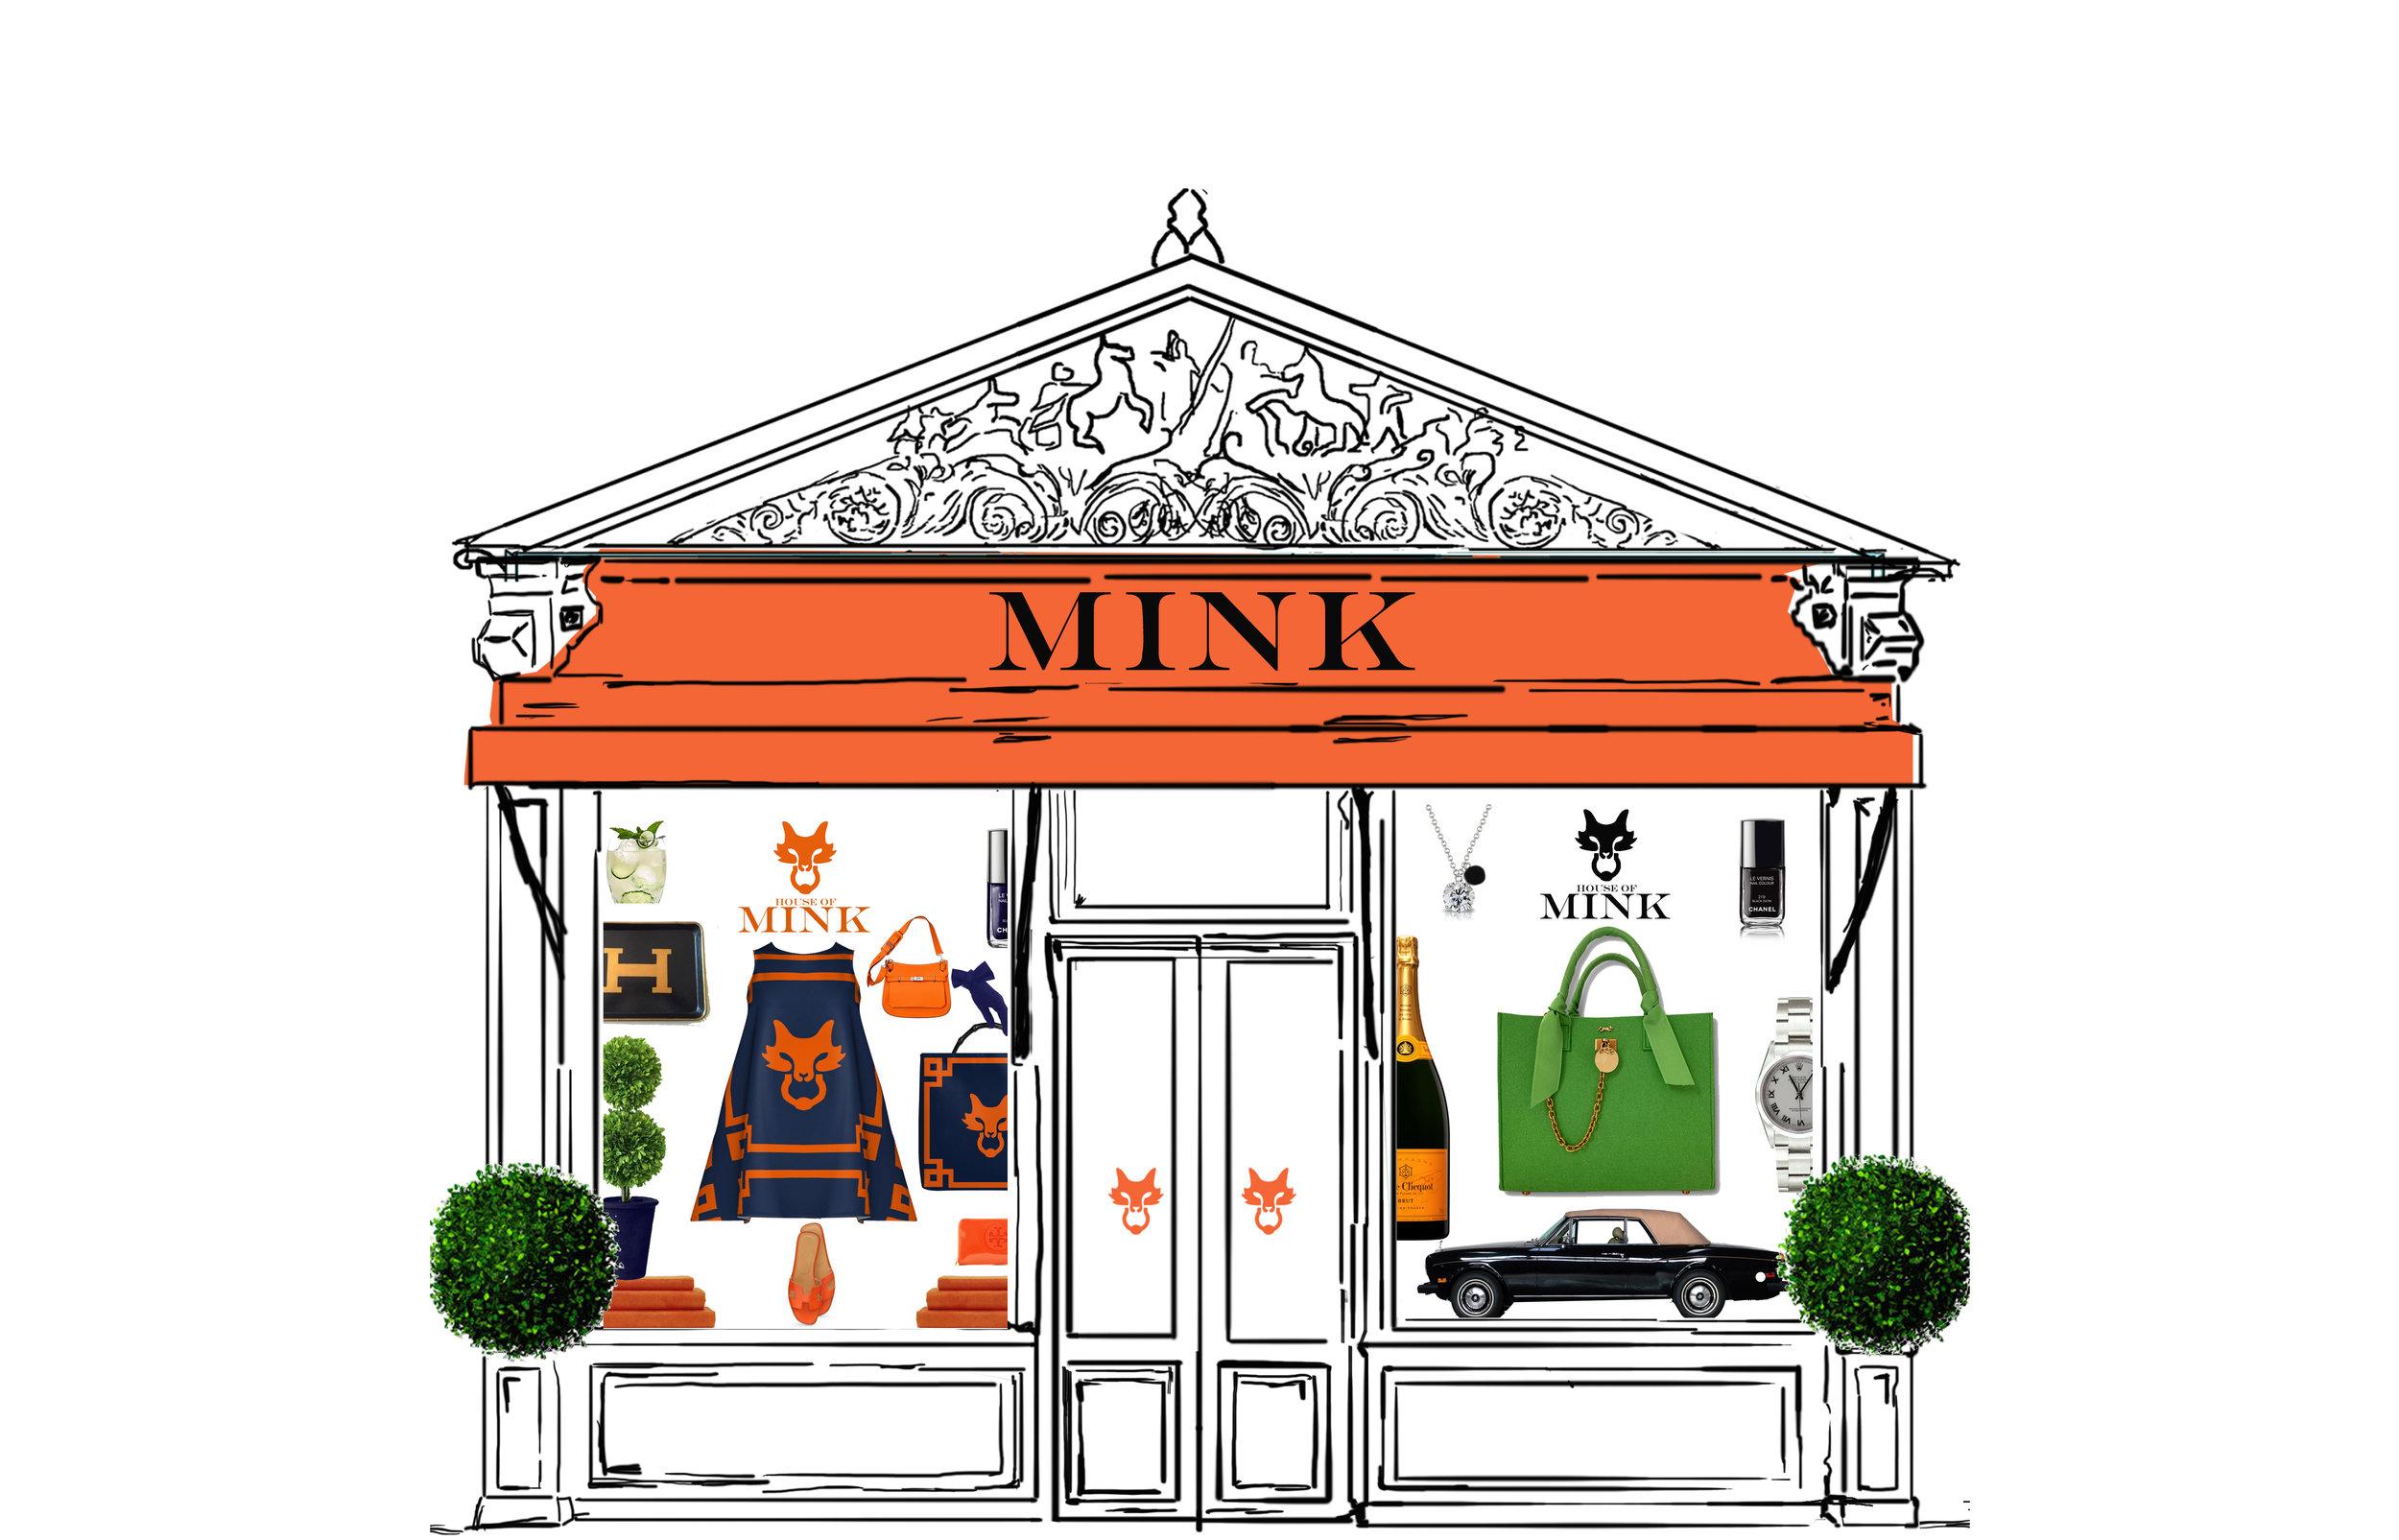 mink_housebuilding12_SHOP3b.jpg